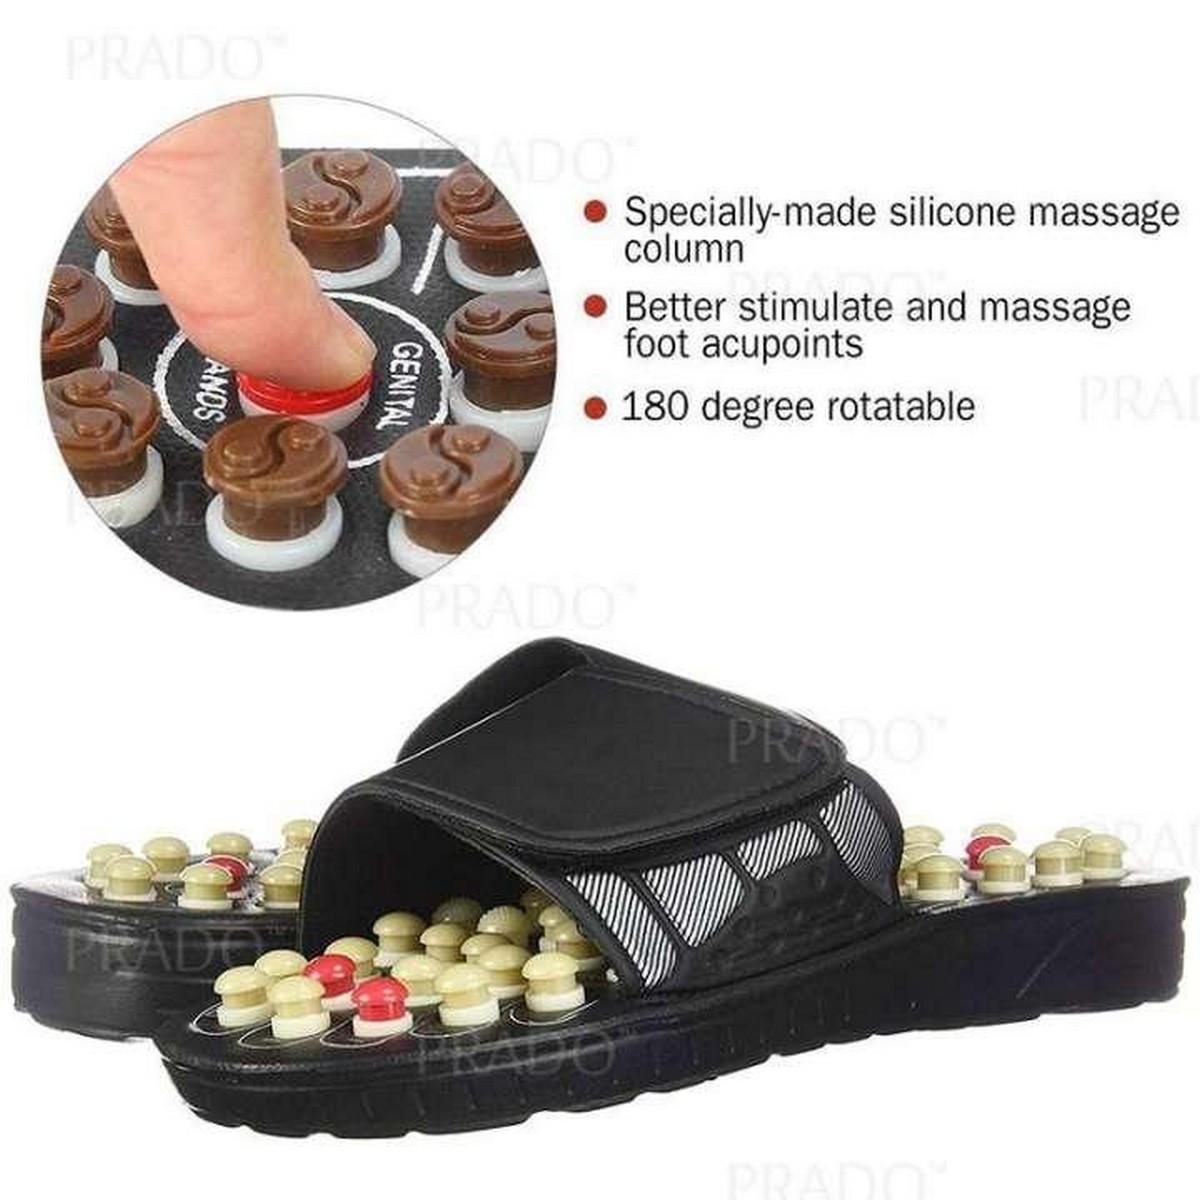 Acupressure Reflexology Foot Heel Crack Pain Healthy Massage Slippers Acupuncture Sandals Shoe Slipper